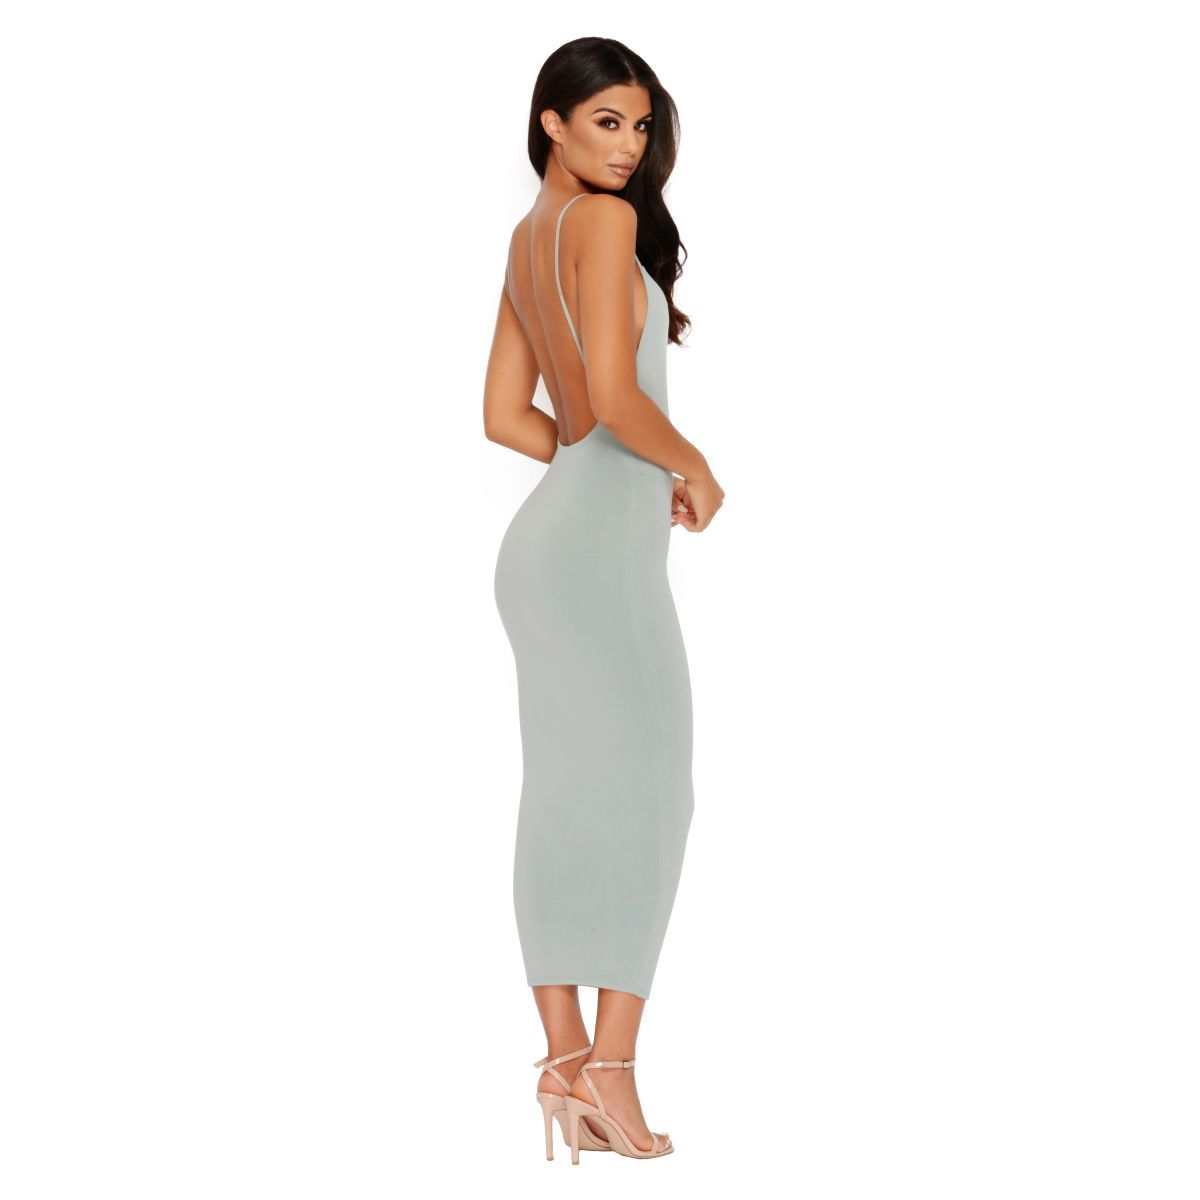 Low Back Strappy Midi Dress Main Strappy Midi Dress Dresses Midi Dress [ 1200 x 1200 Pixel ]